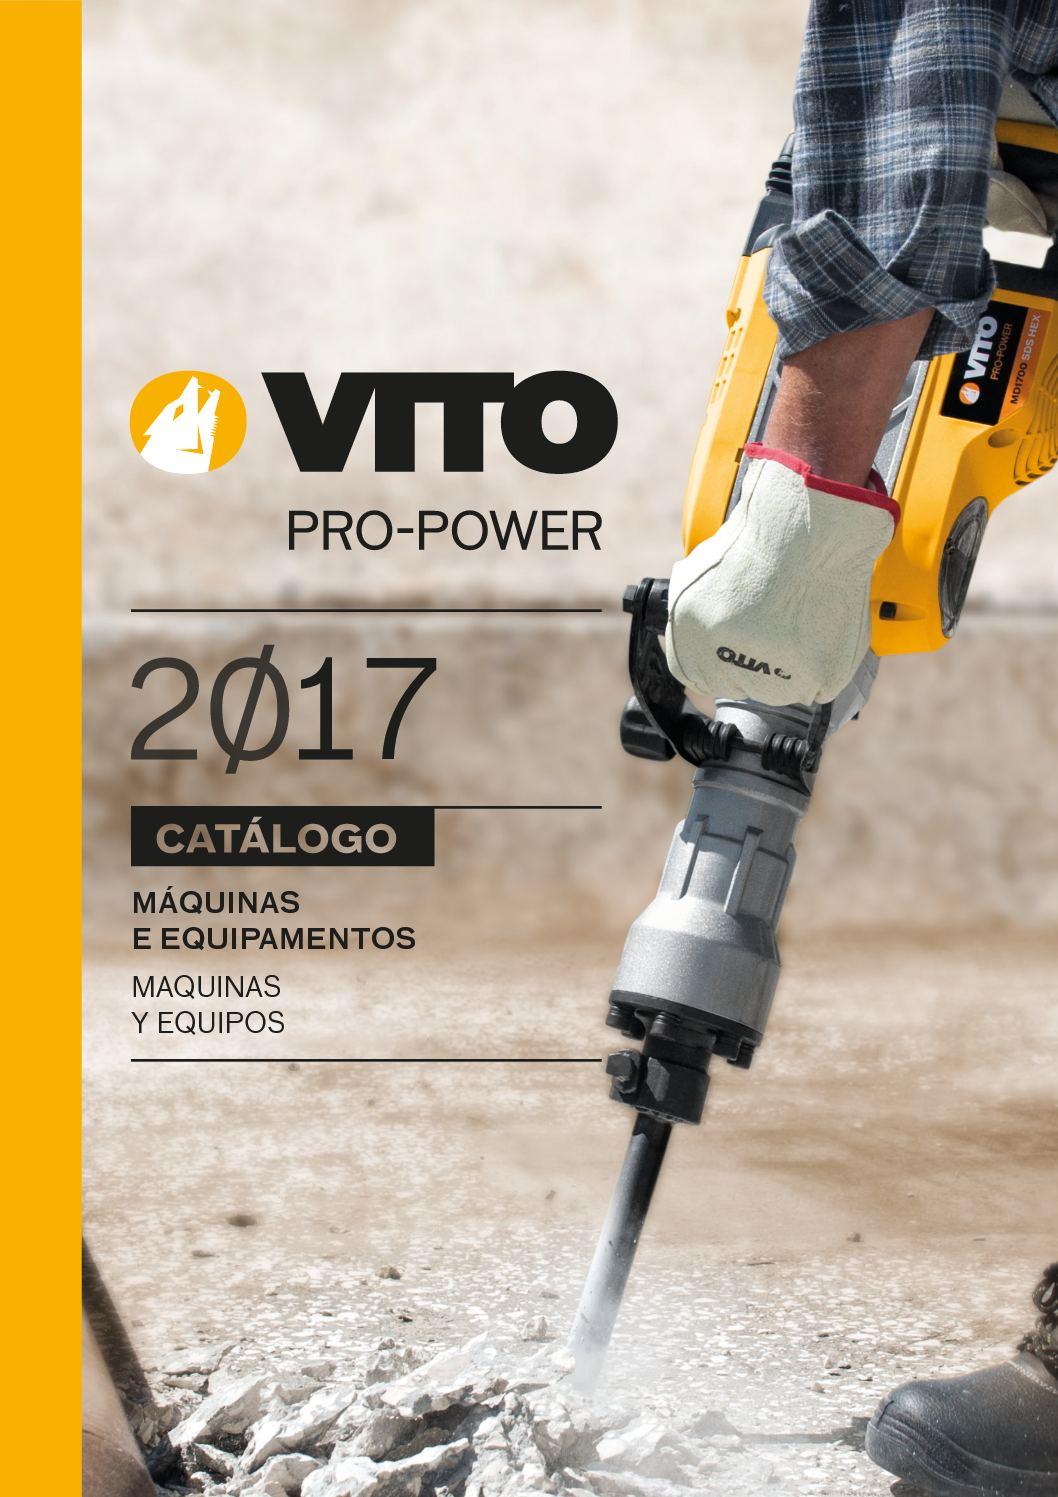 Catálogo Vito Propower 2017